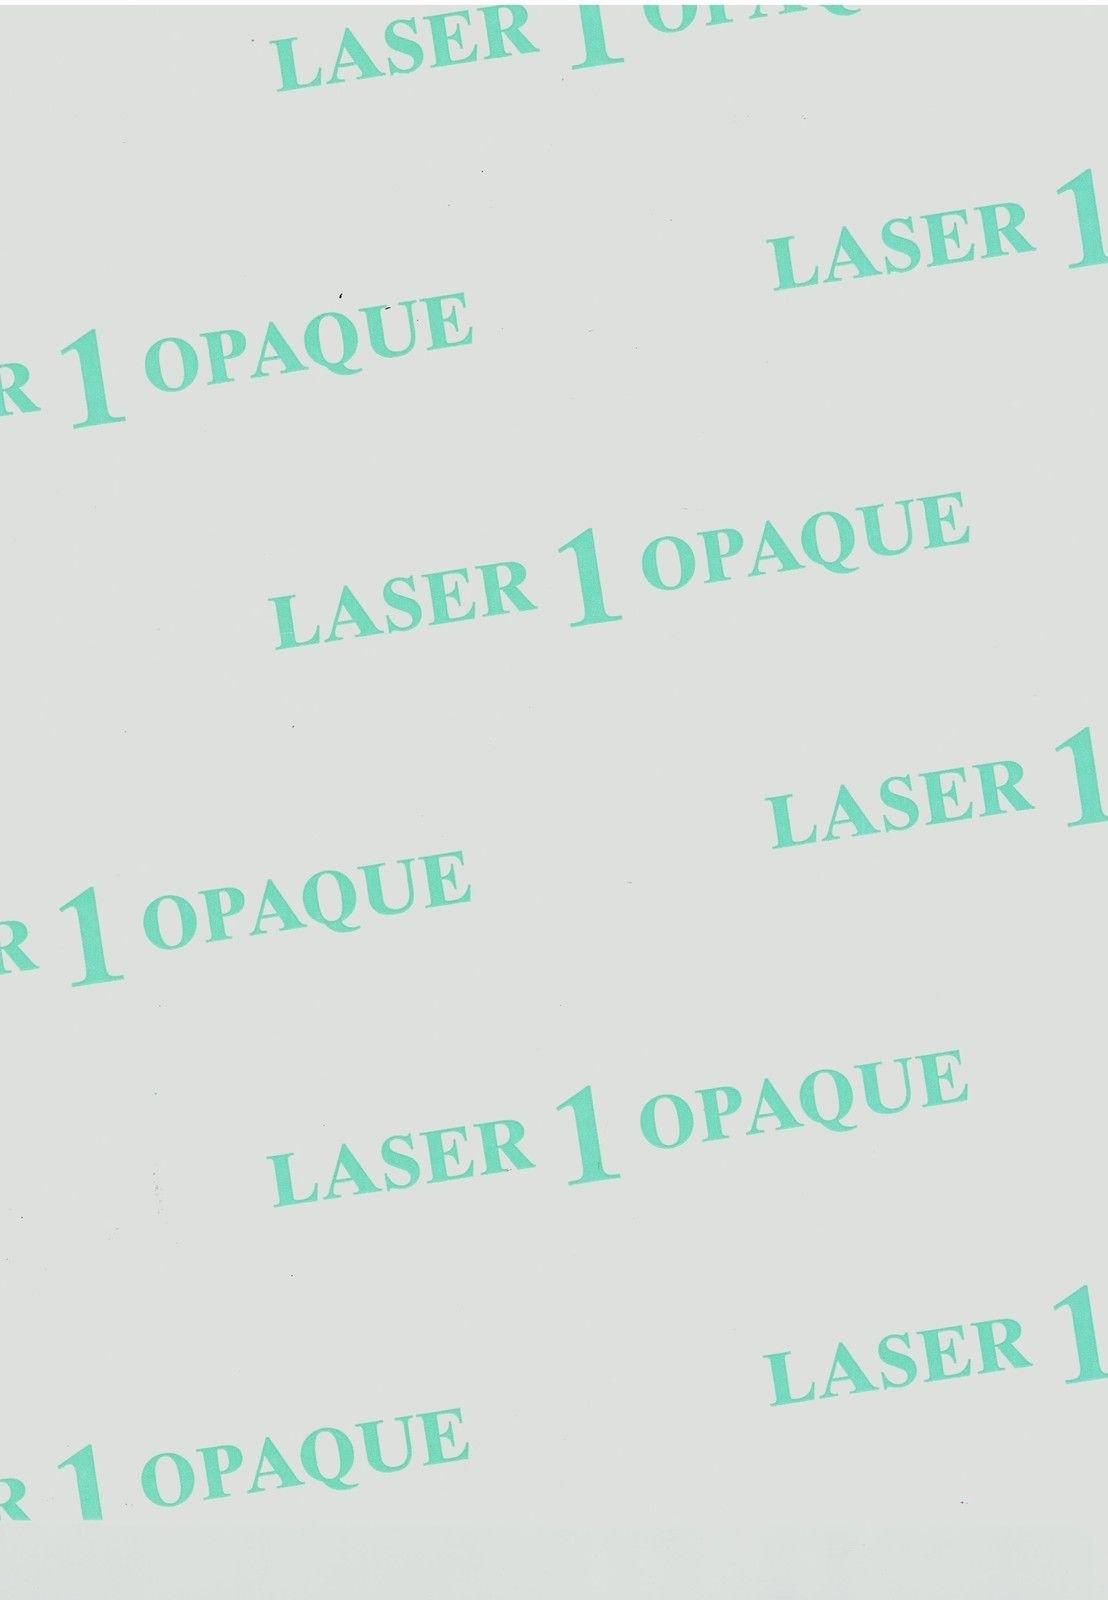 LASER TRANSFER PAPER FOR DARK FABRIC: NEENAH ''LASER 1 OPAQUE'' (11''x17'') 25Pk :)